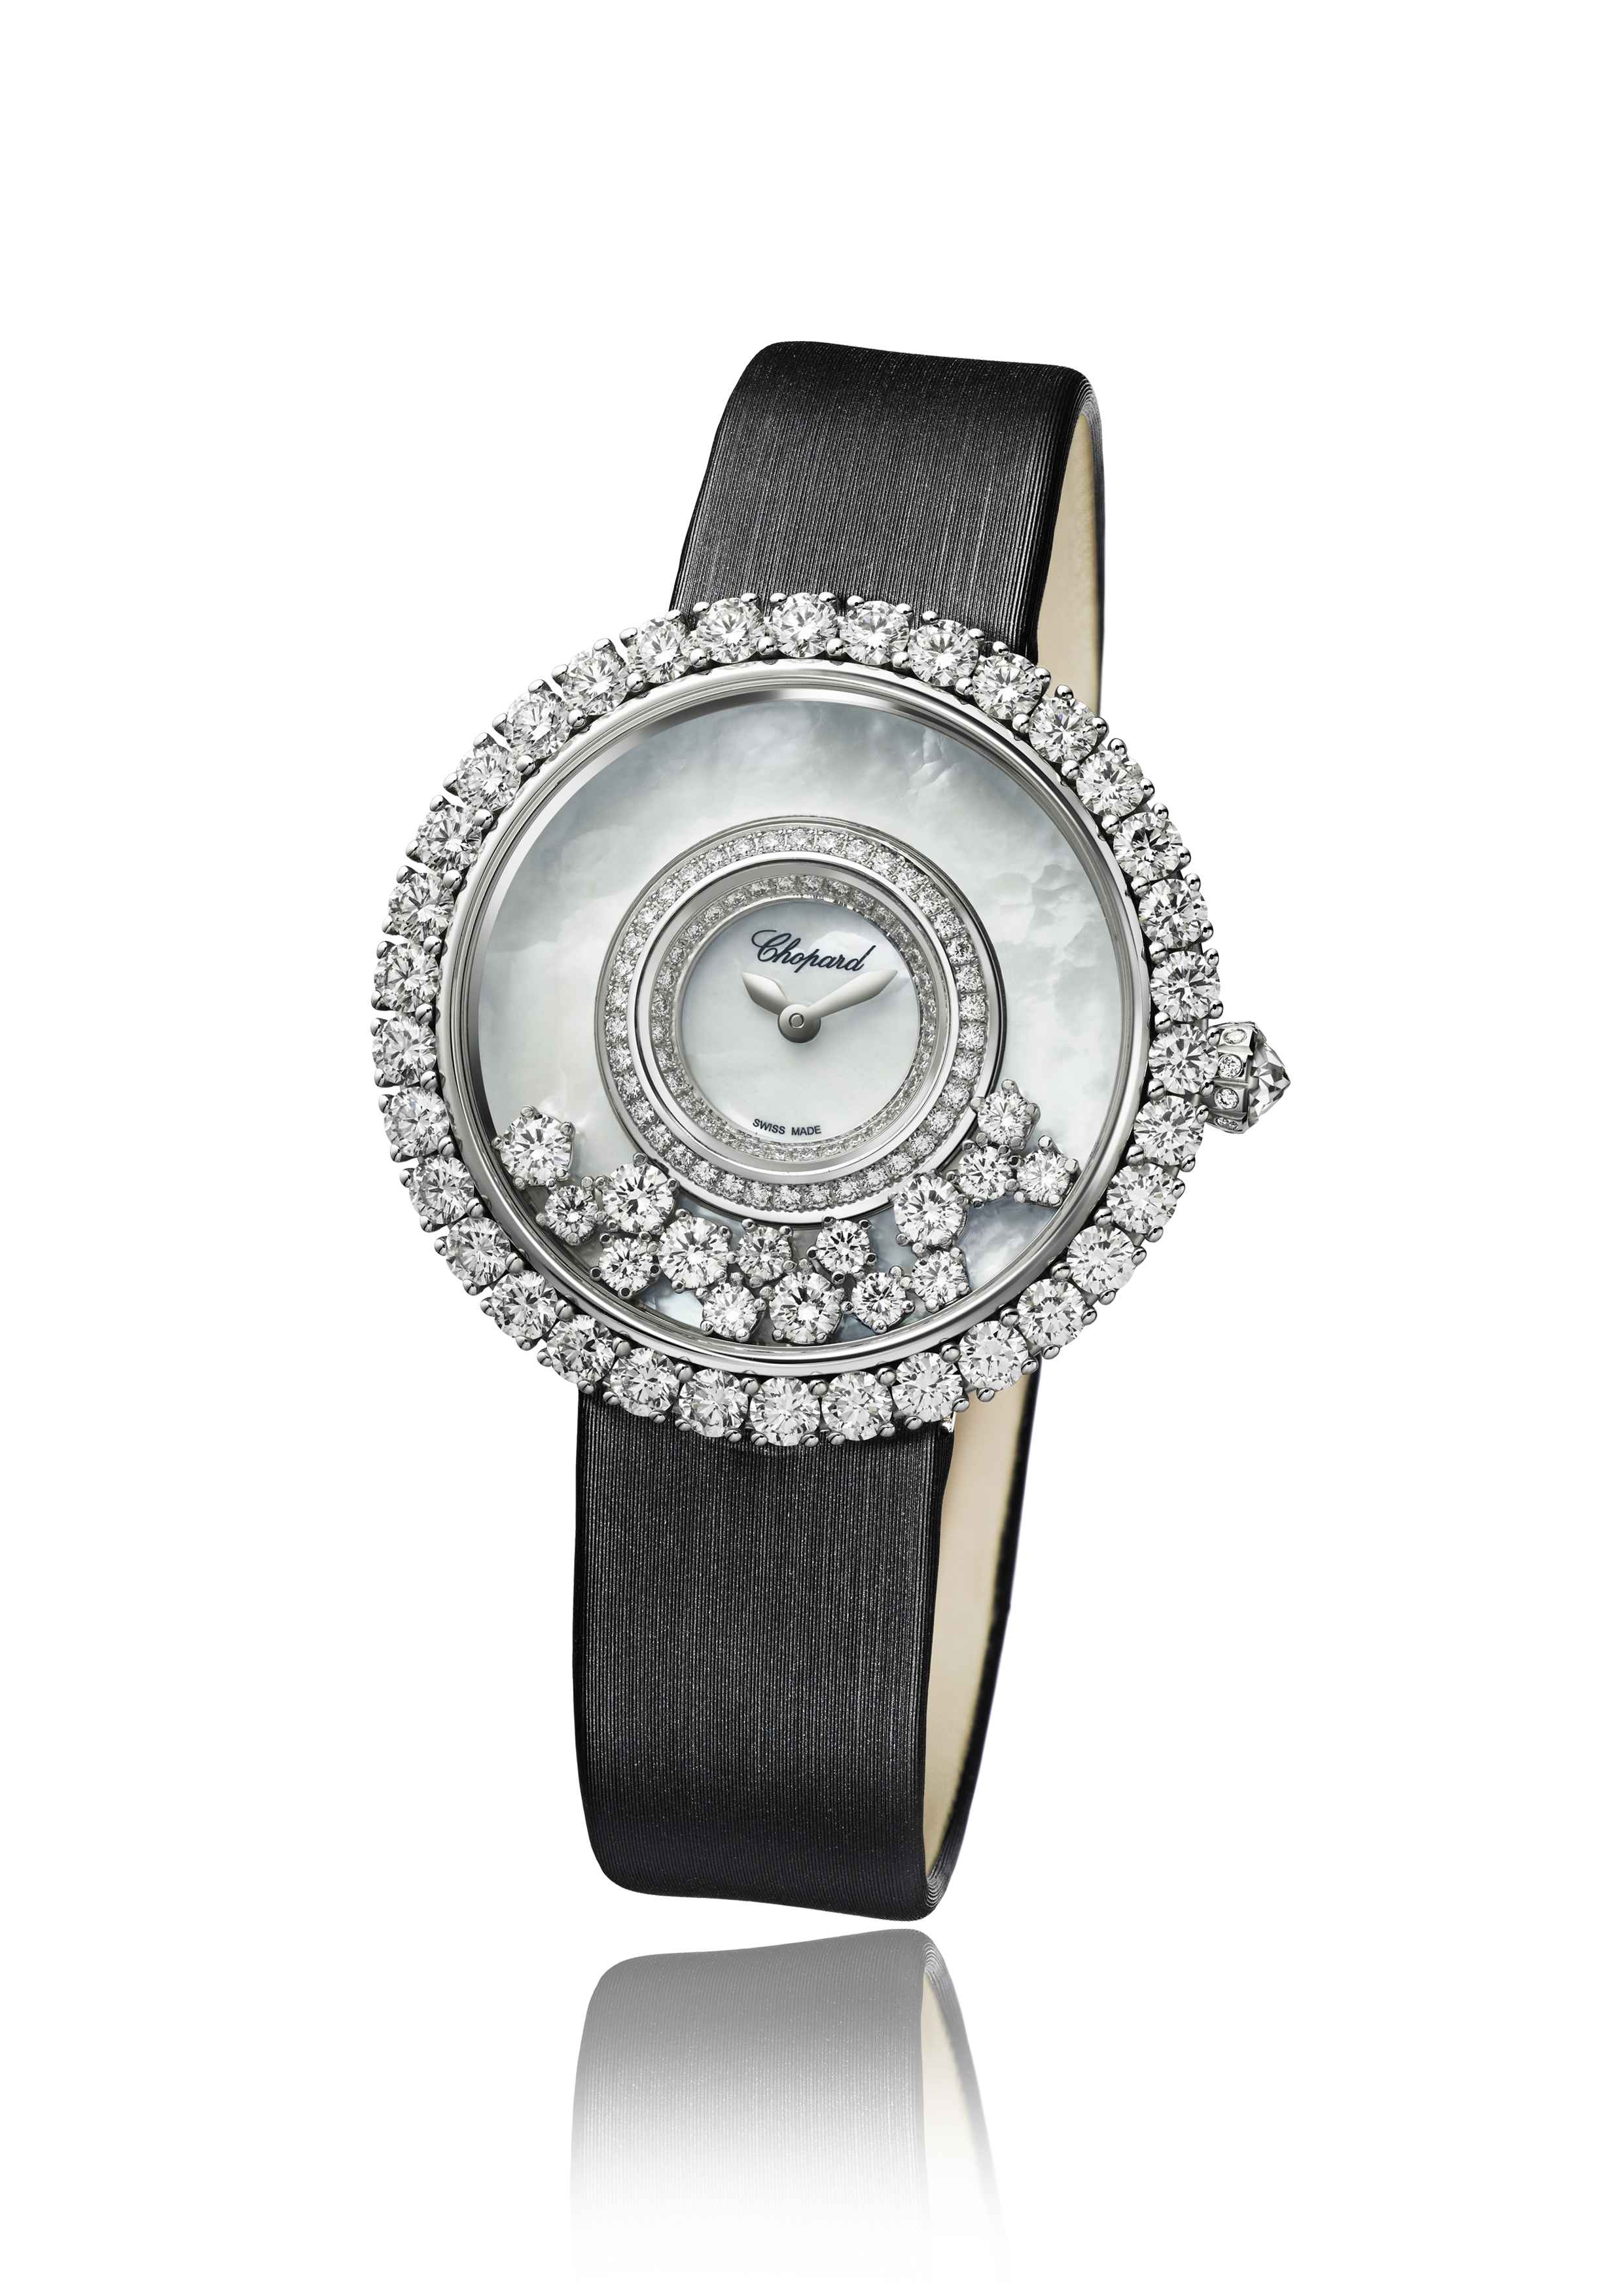 Chopard Happy-Diamonds-watch-5-round-204445-1001.jpg